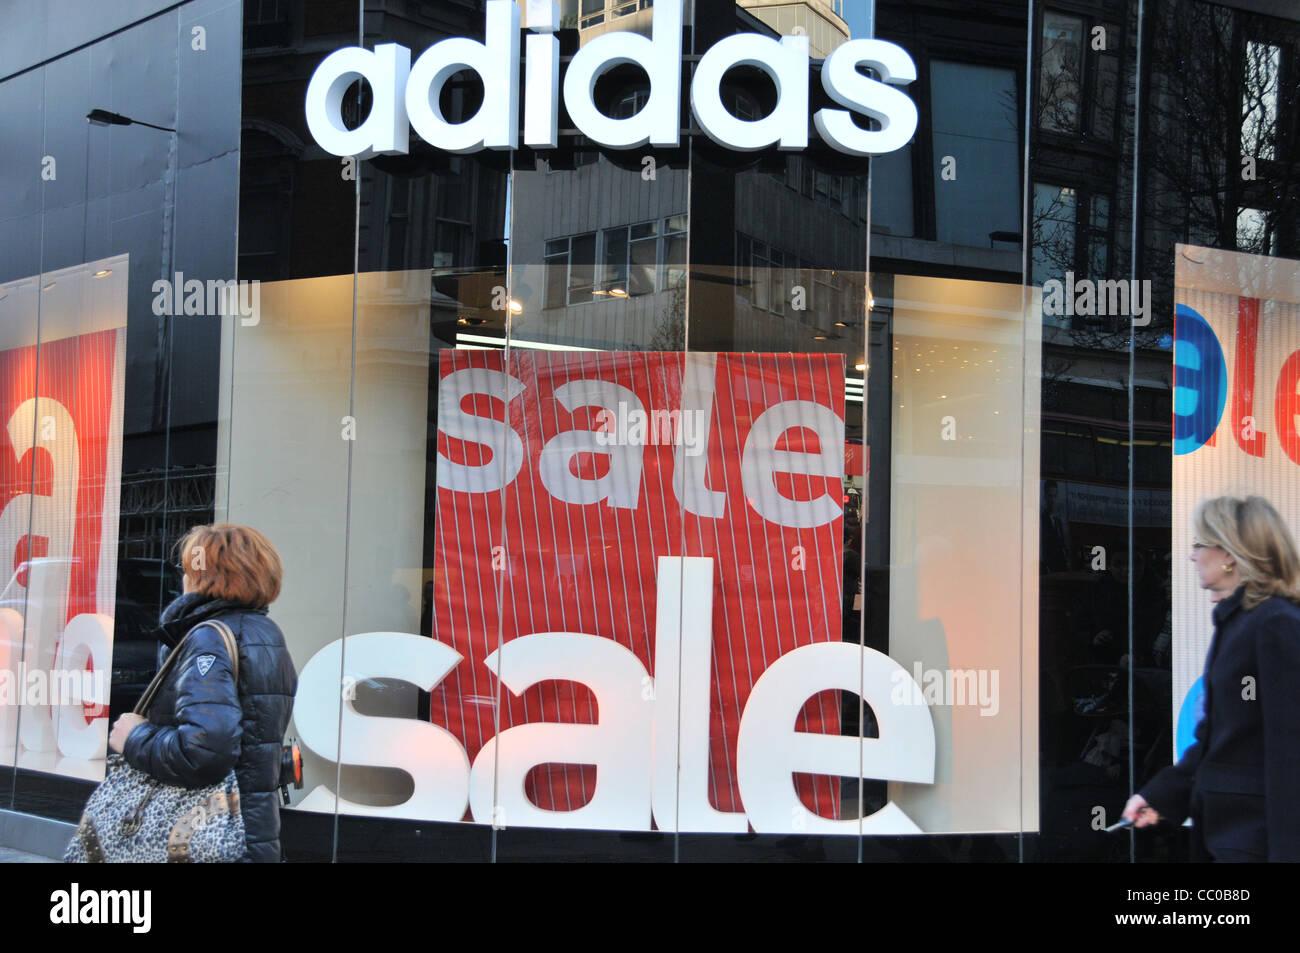 Adidas January Sales London Retail sales sale signs Oxford street London  2012 c0e133043